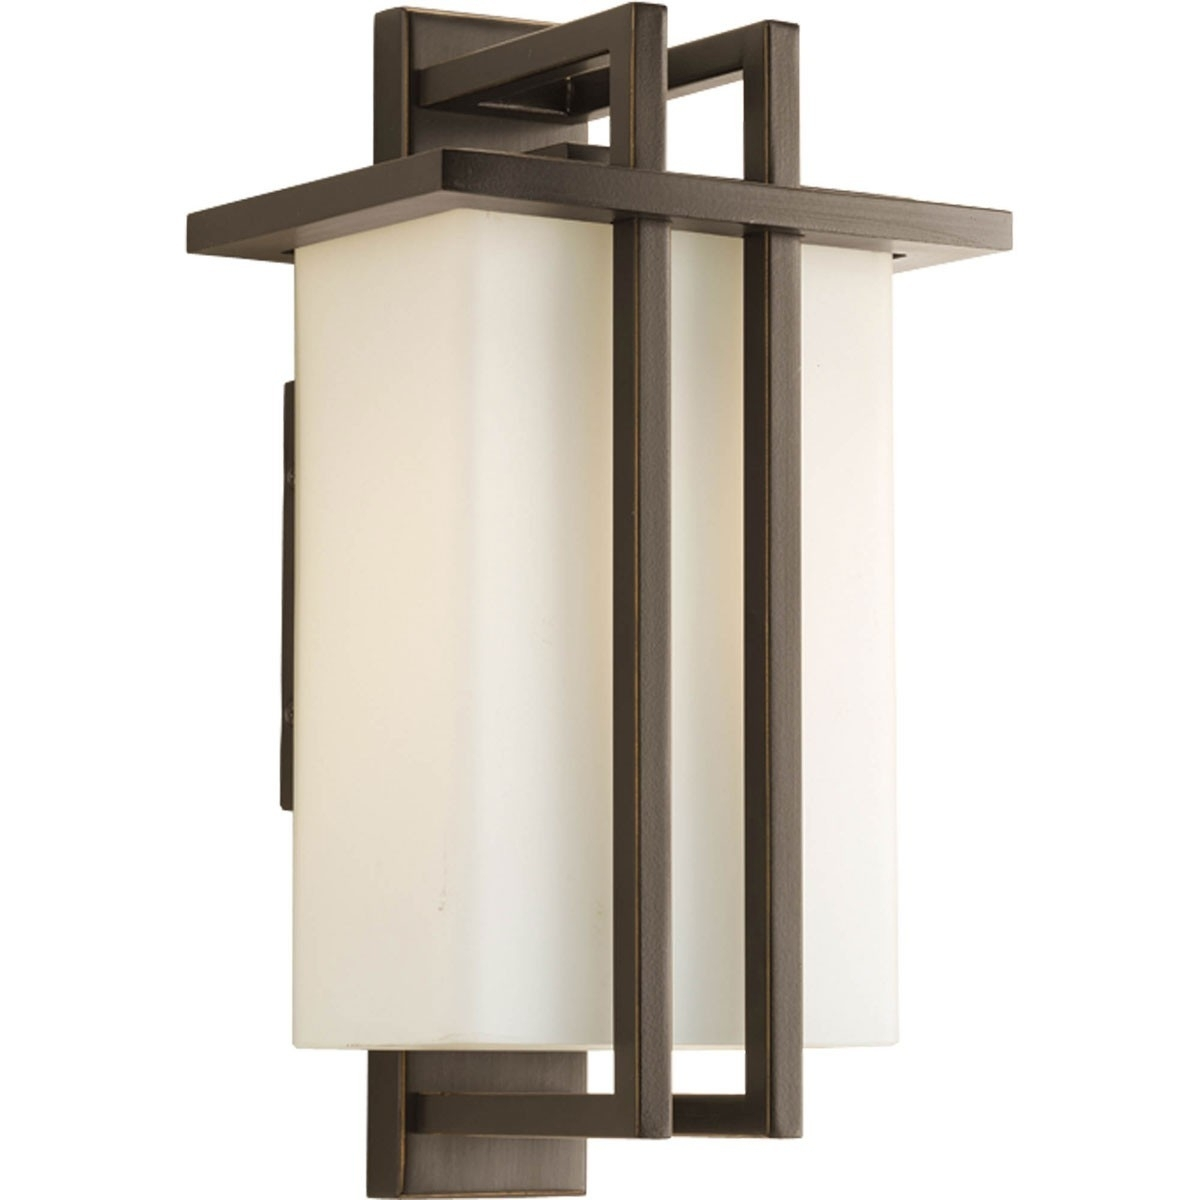 Outdoor Small Hanging Lantern Light Fixture – Progress Lighting With Regard To Outdoor Hanging Wall Lanterns (View 11 of 15)